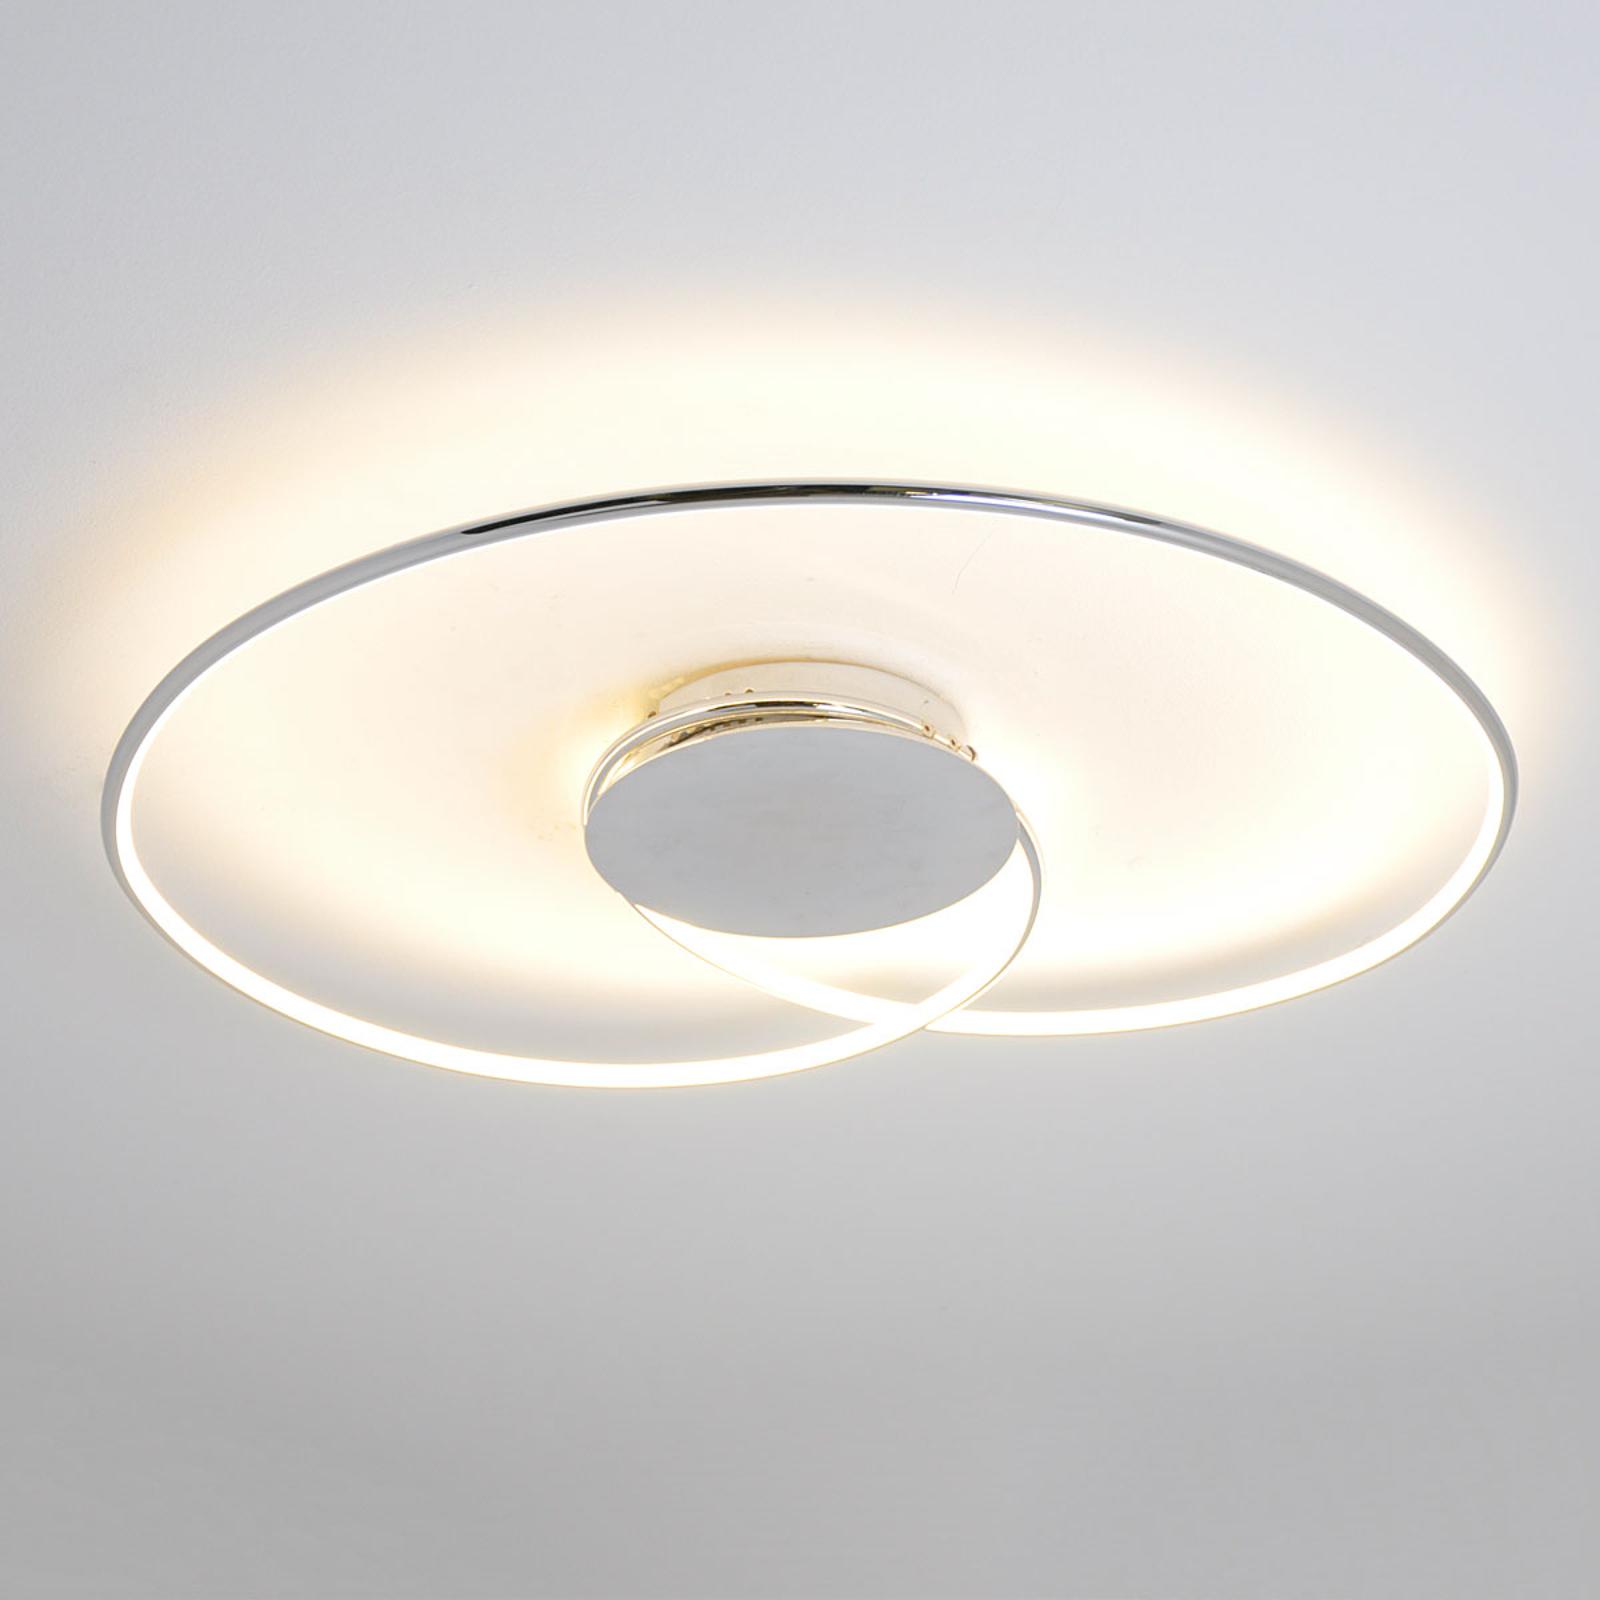 Drobna lampa sufitowa LED Joline